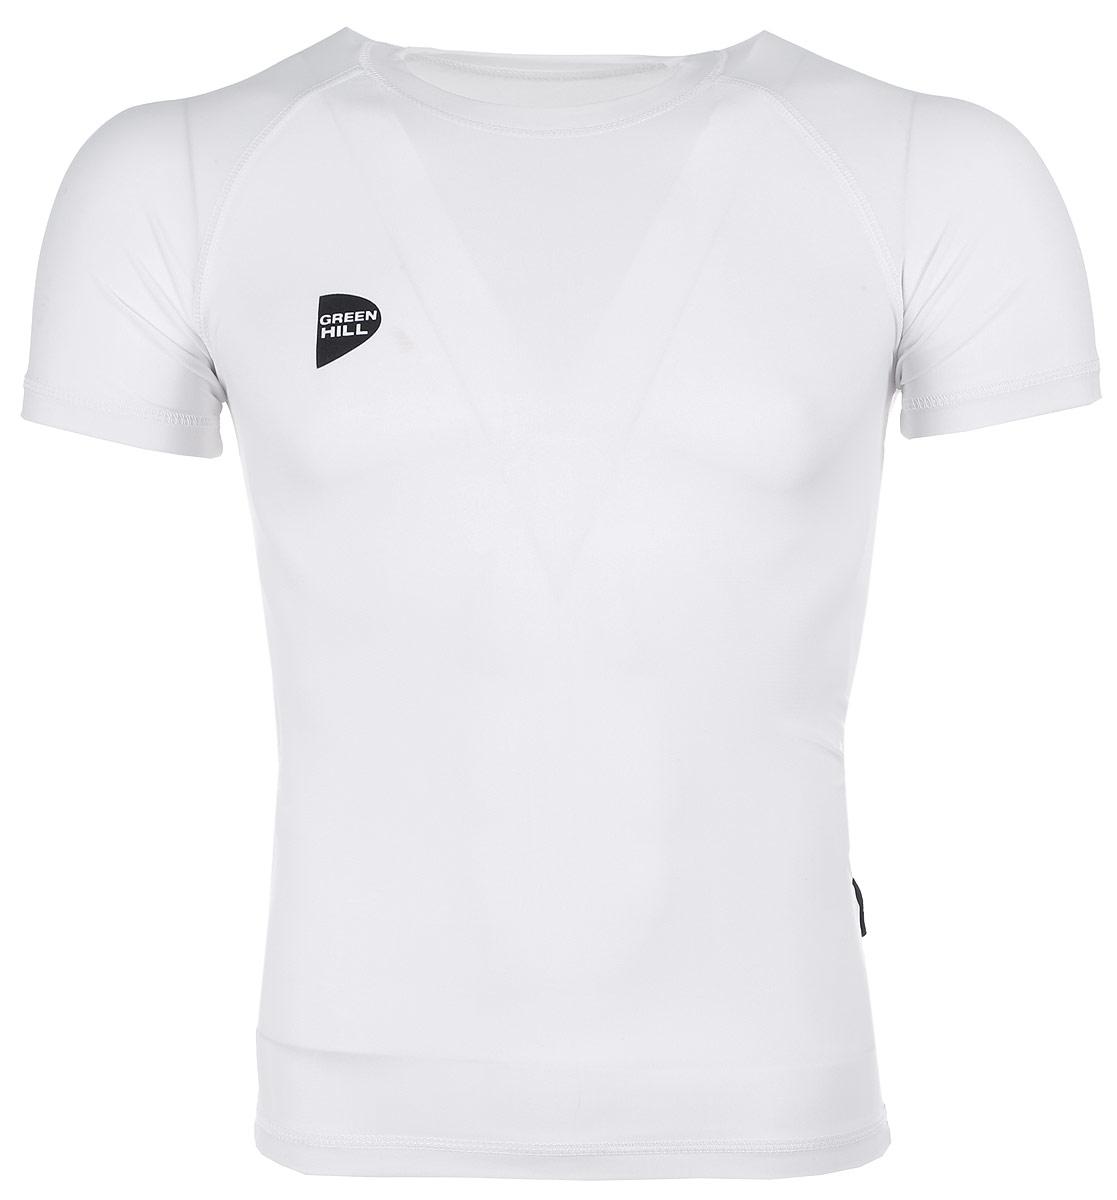 Защитная футболка Green Hill, цвет: белый. Размер XL. RGS-3558fRGS-3558fЗащитная футболка с длинным рукавом. Материал: полиэстер/лайкра. Размеры: Длина 69 см ширина 45 см длина рукава от плечевого шва 64 см